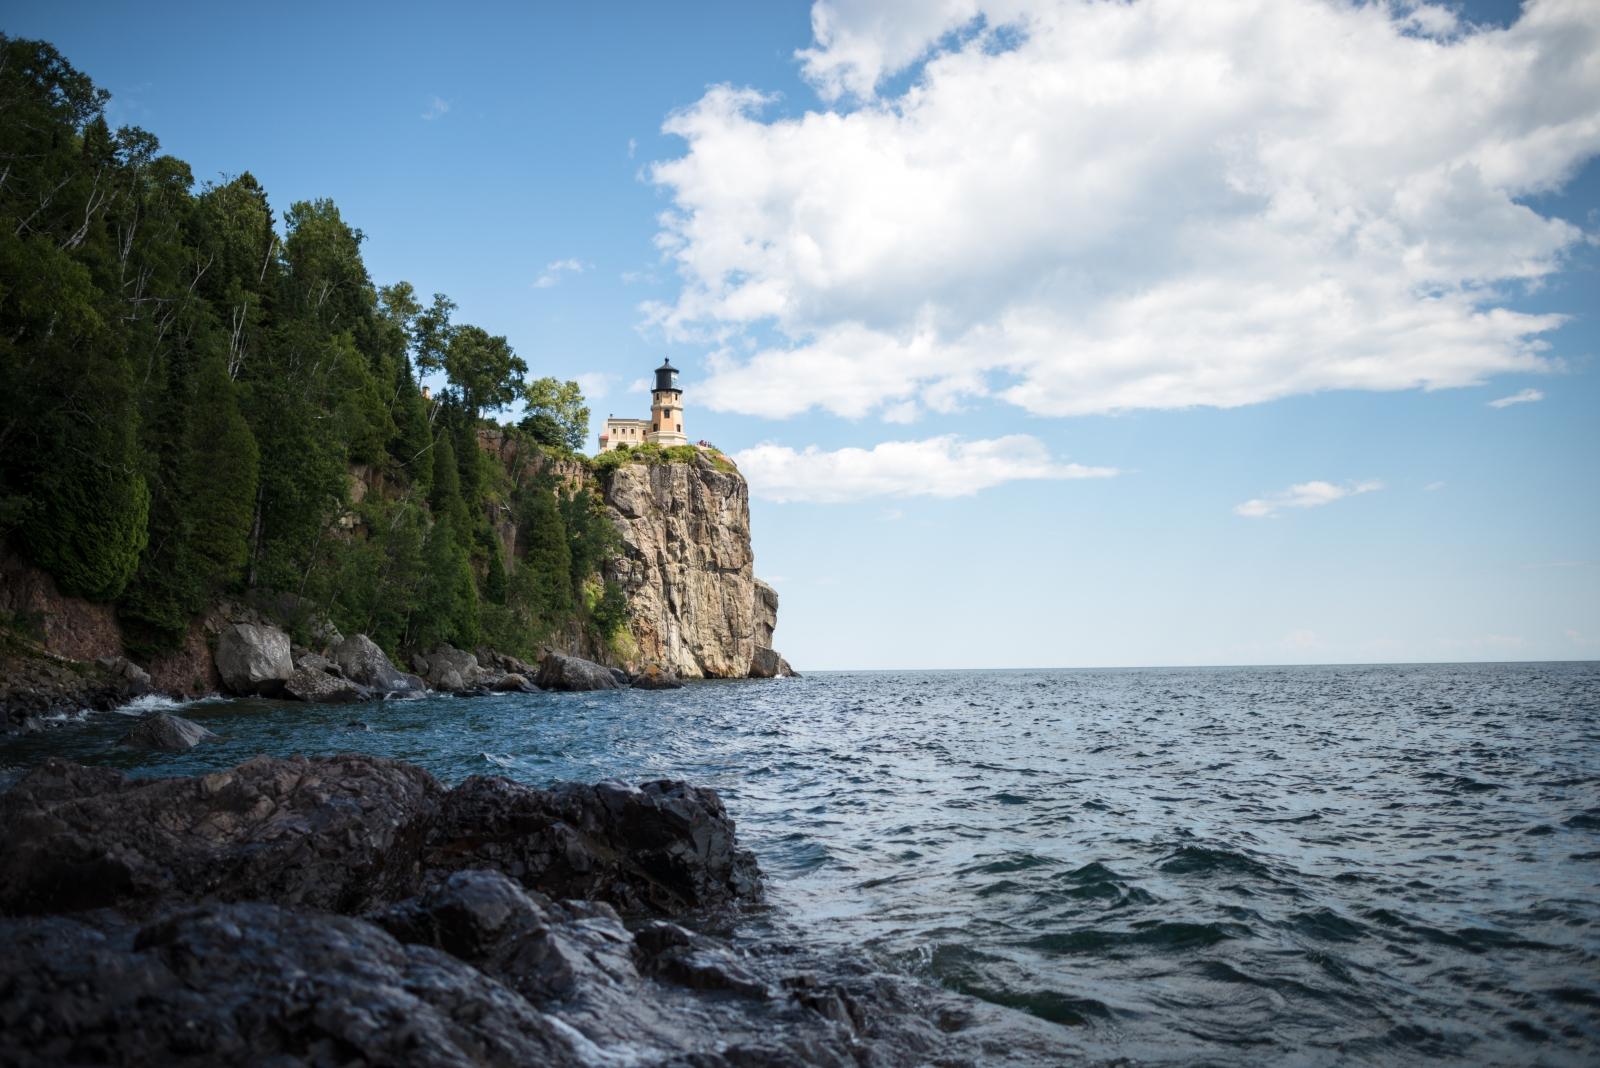 Split Rock Lighthouse on Lake Superior. Photo courtesy Scottie/Fotolia.